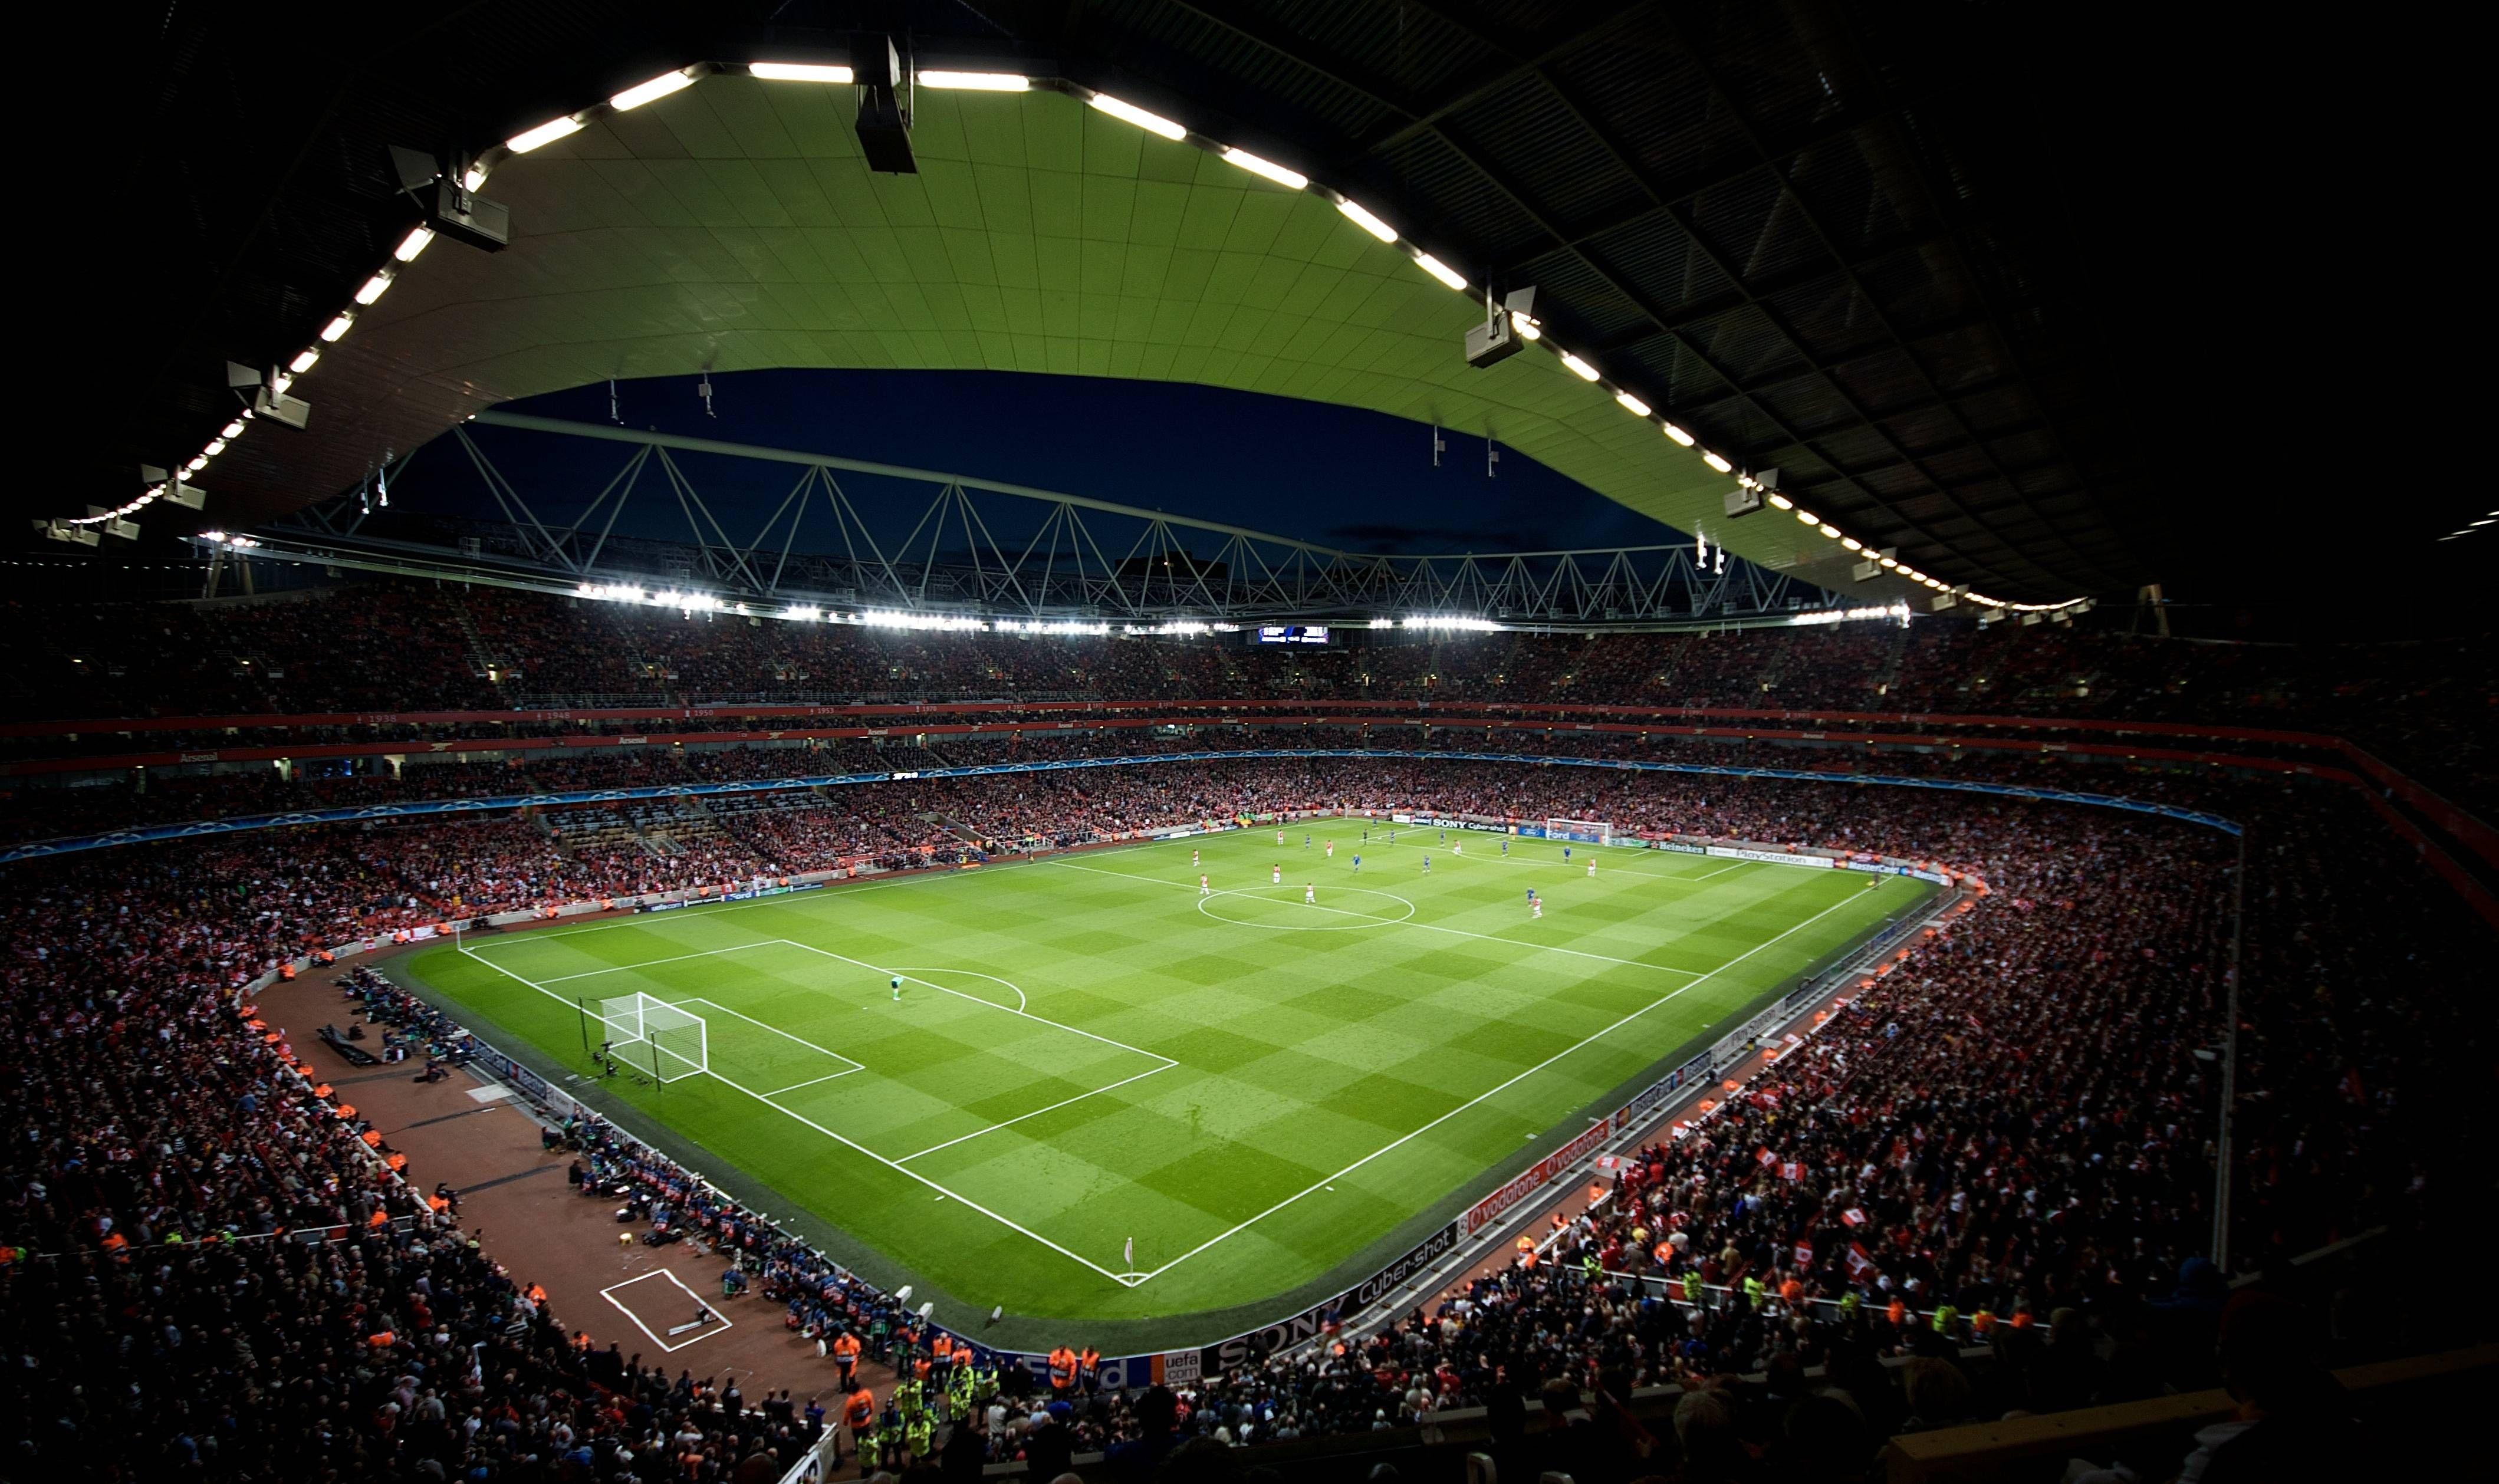 Soccer Stadium Wallpaper Free 4br World Cup Stadiums Soccer Stadium Brazil World Cup